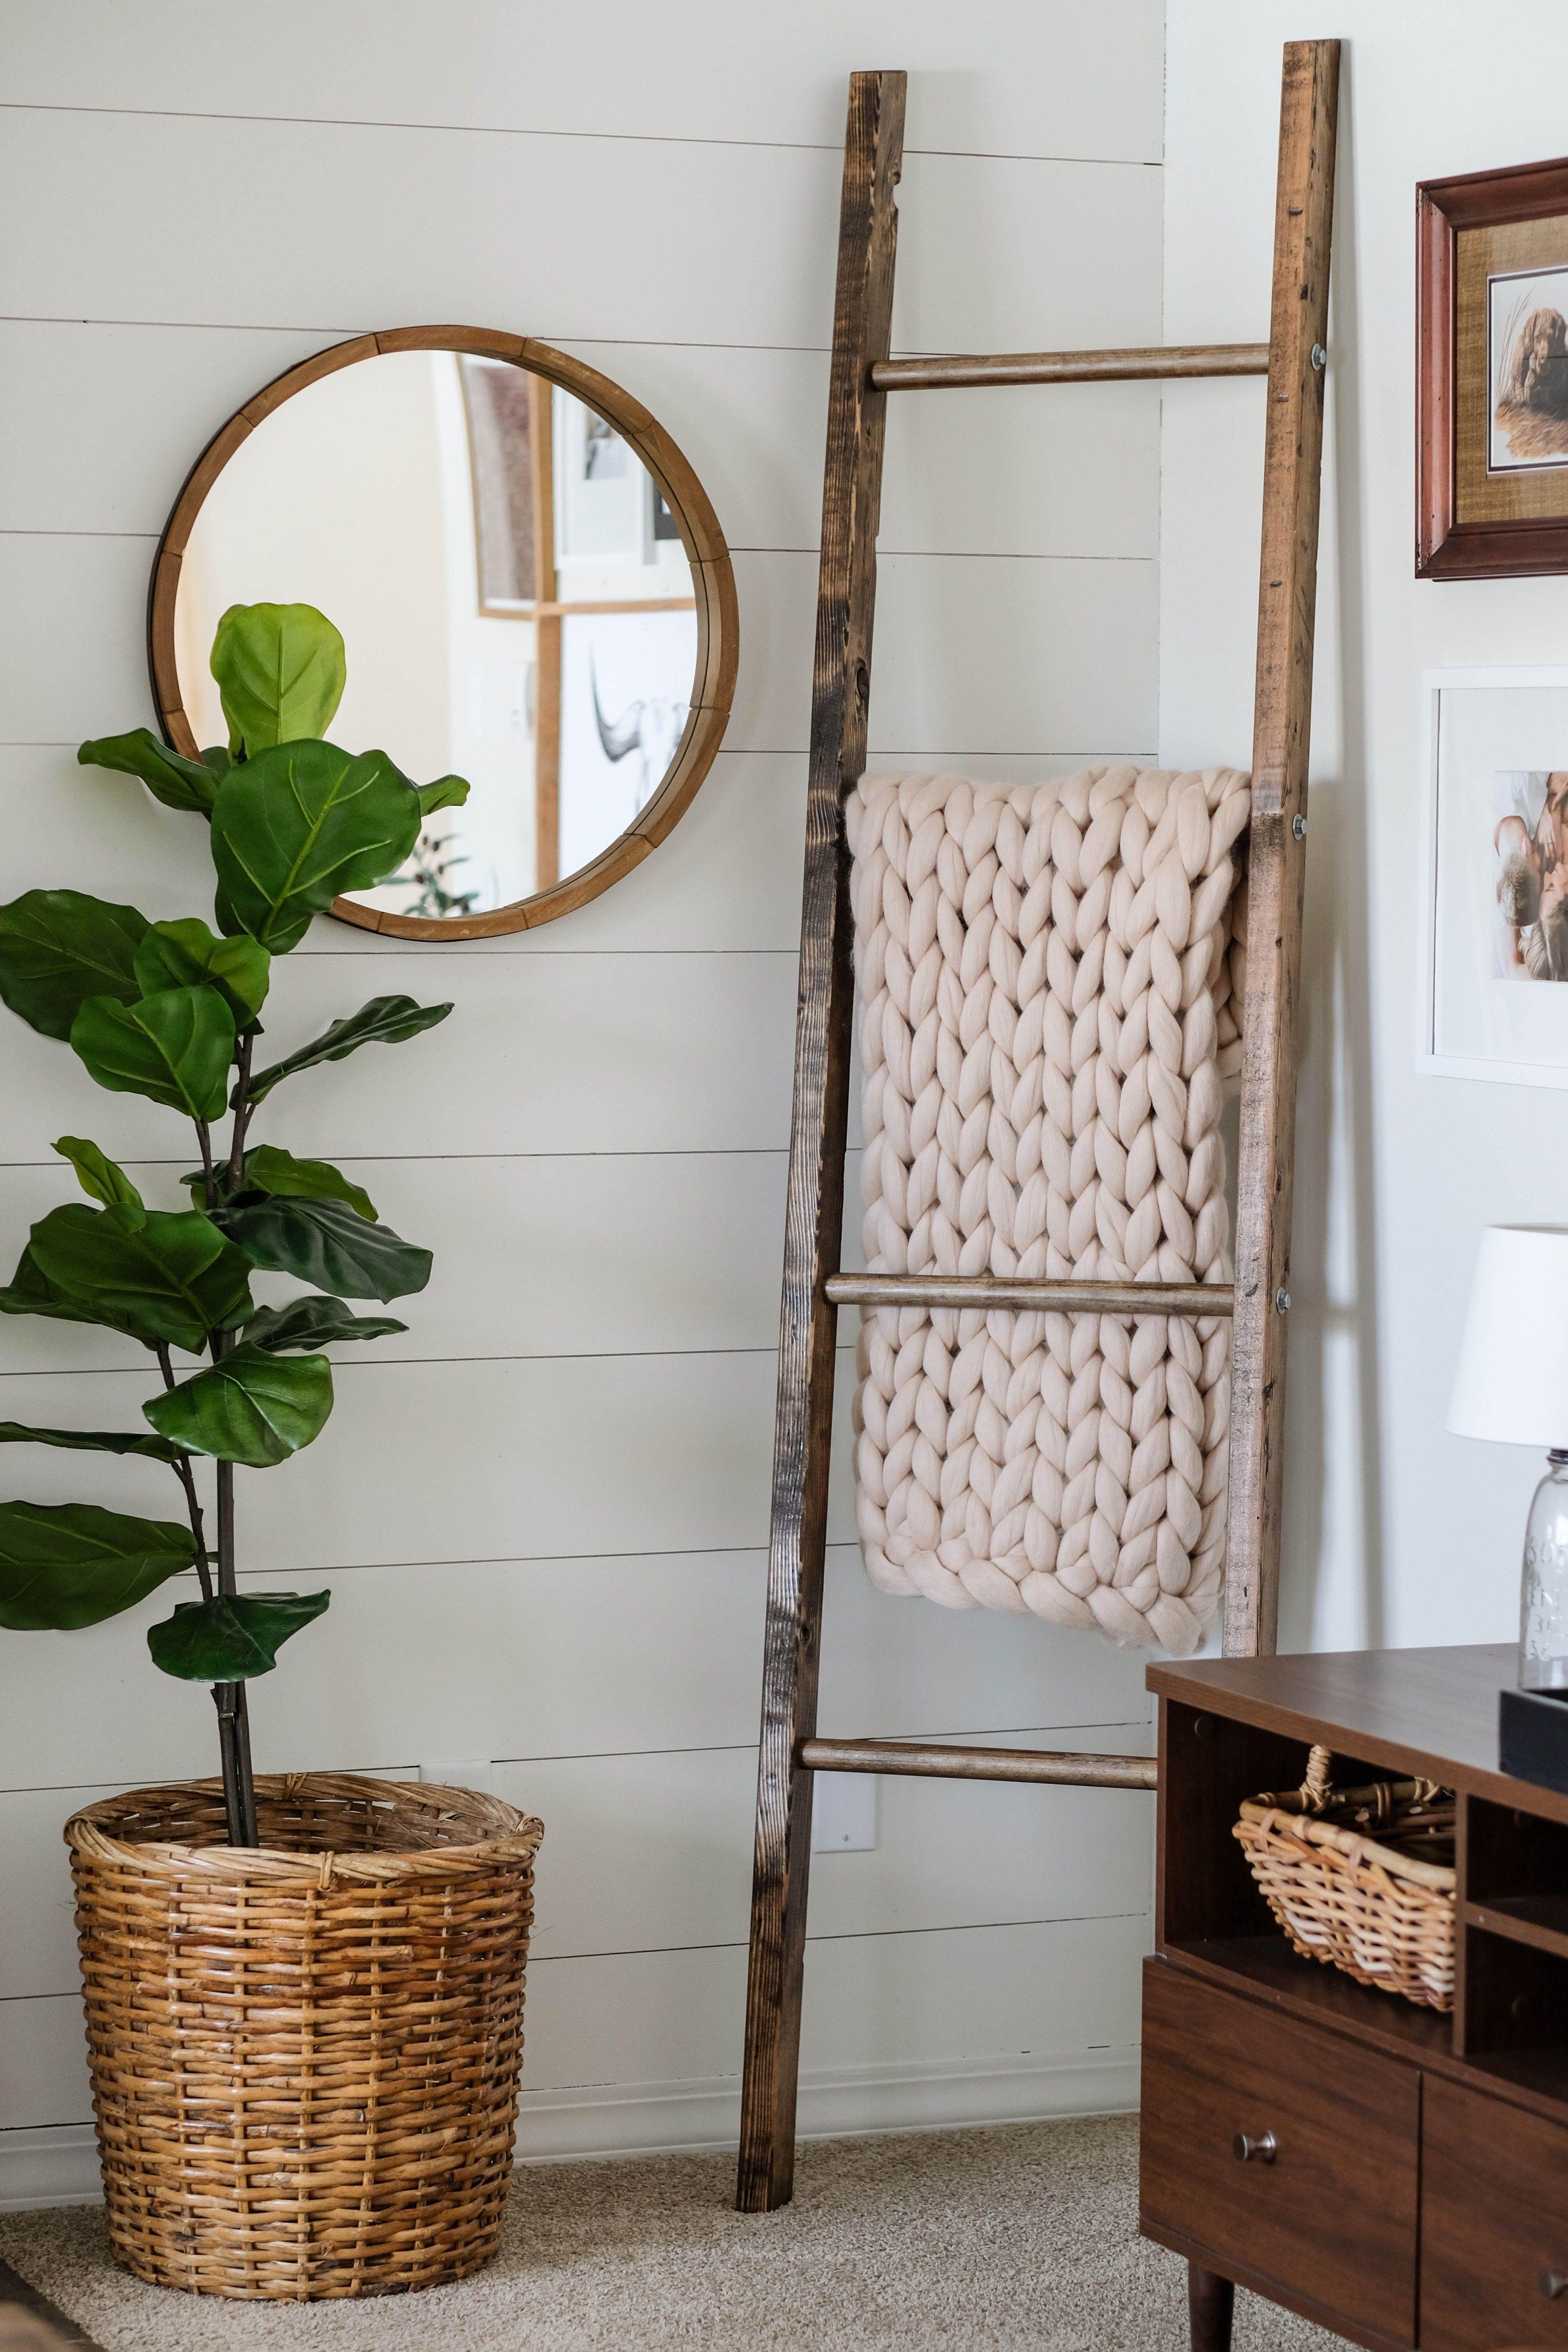 How To Make A Diy Blanket Ladder For Less Than 15 Get The Free Plans For This Rustic Blanket Ladder And Start St Ladder Shelf Decor Corner Decor Ladder Decor